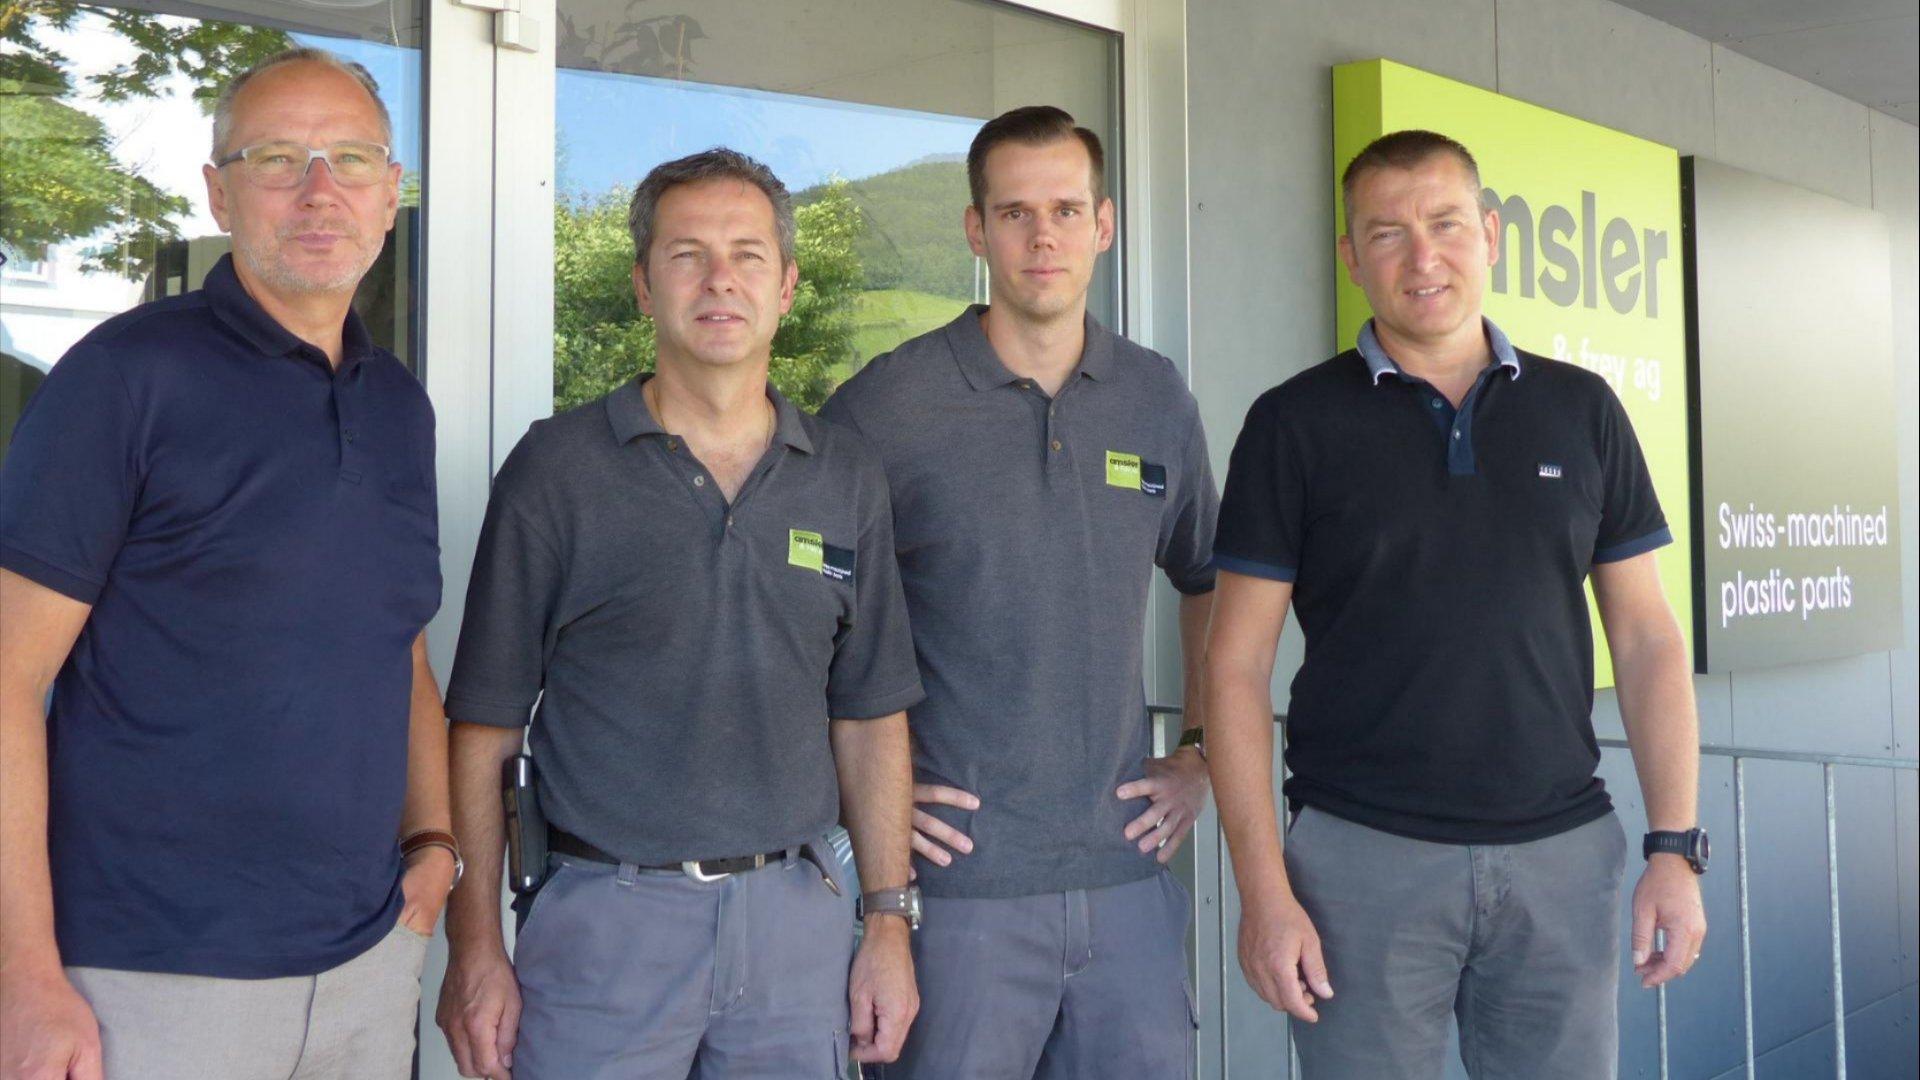 Jürg Solenthaler, Michael Rüthi, Marcel Heiniger und Thomas Gloor (vlnr.)